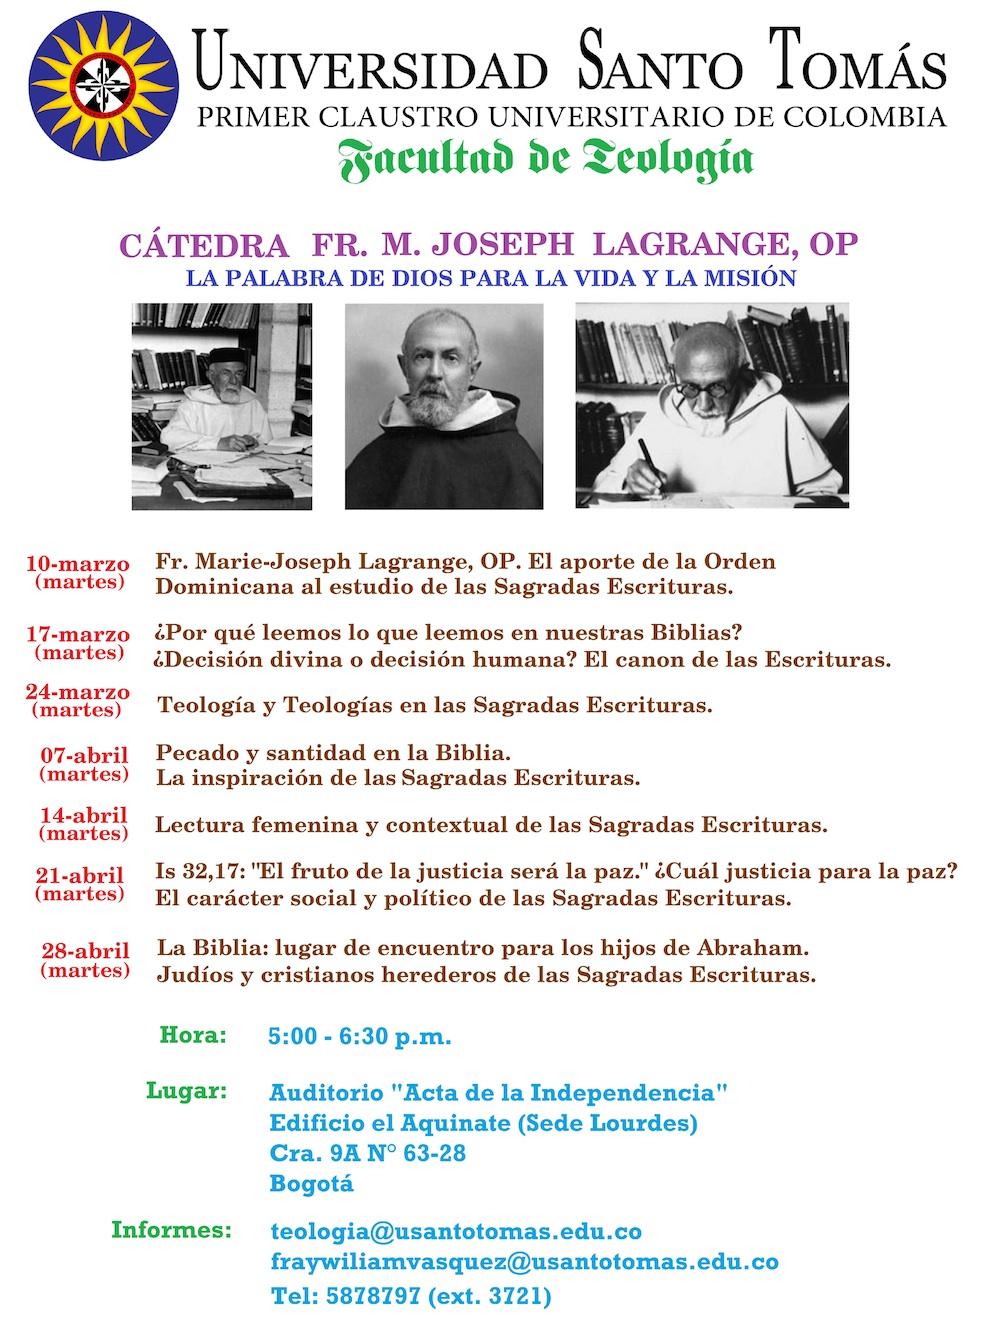 Catedra MJ Lagrange